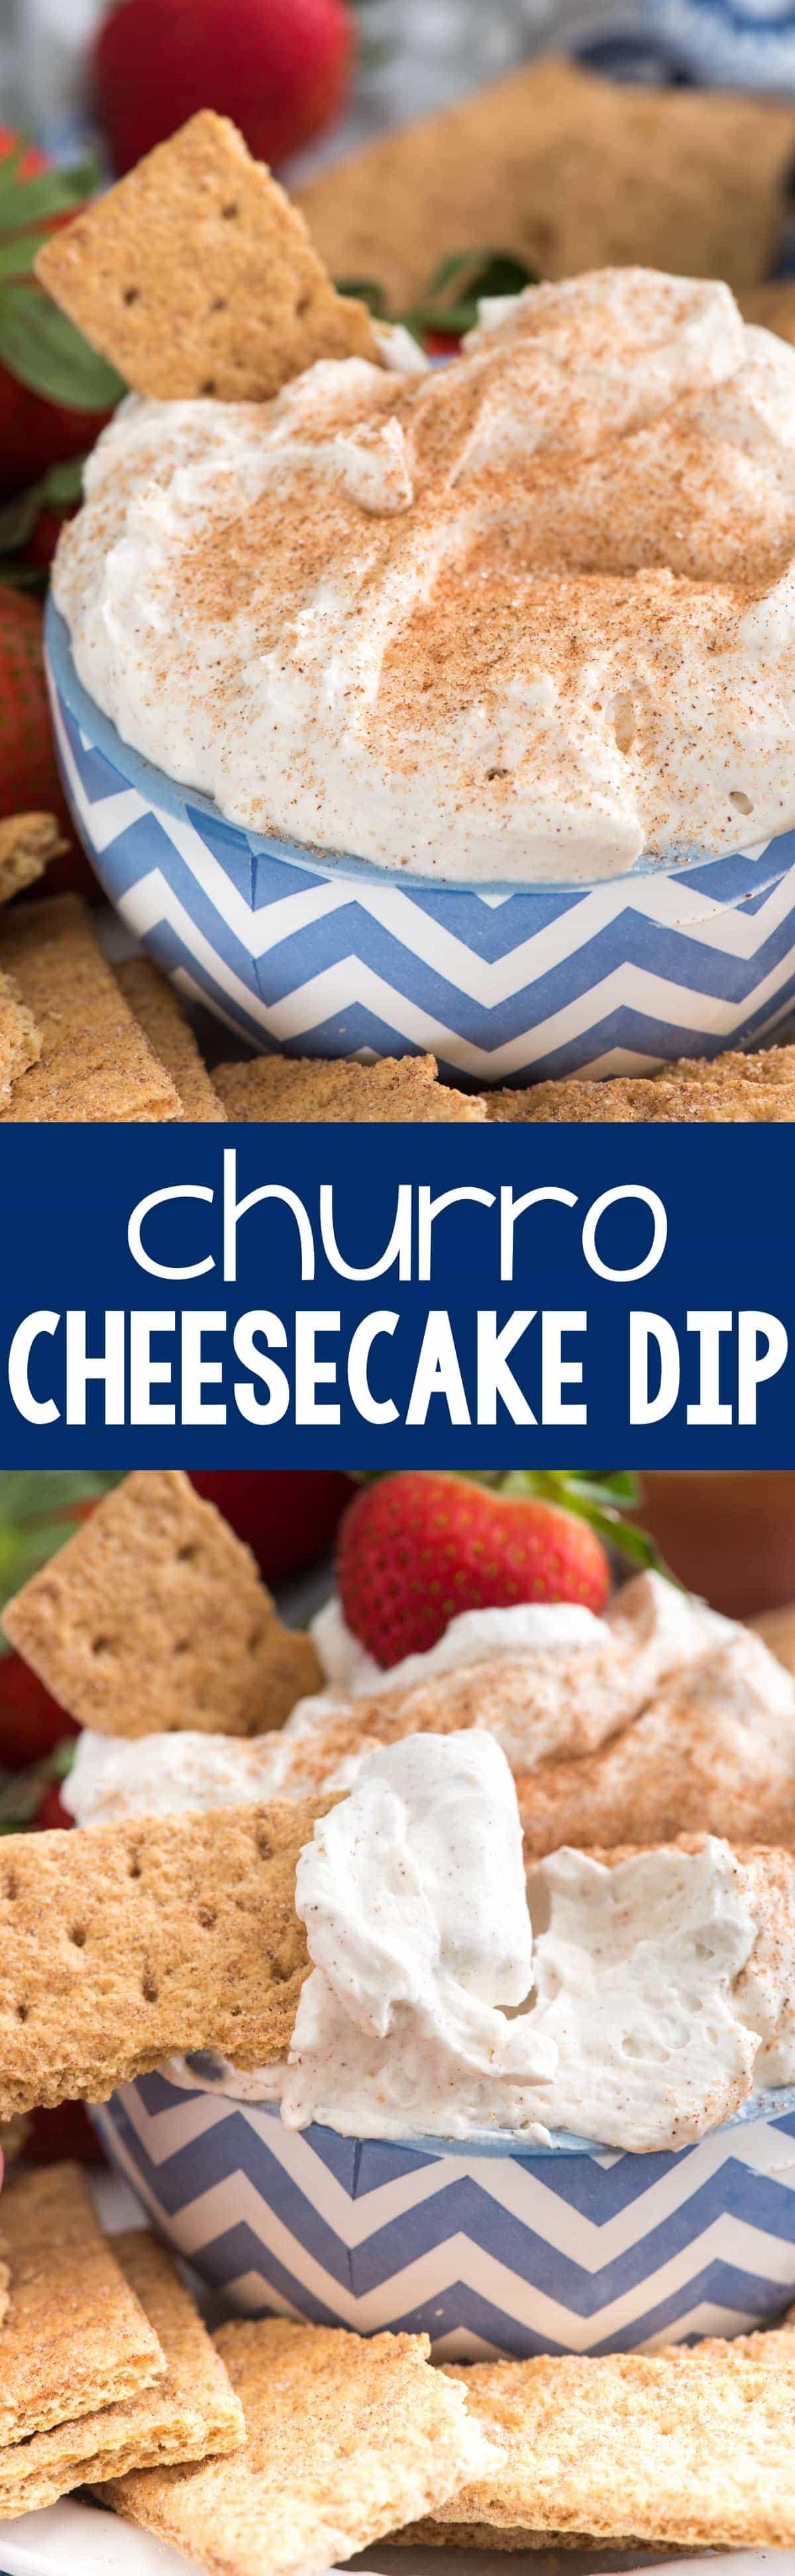 Churro Cheesecake Dip - an easy way to make no-bake cheesecake dip full of cinnamon sugar churro flavor! This is the perfect party dip or an easy dessert recipe.